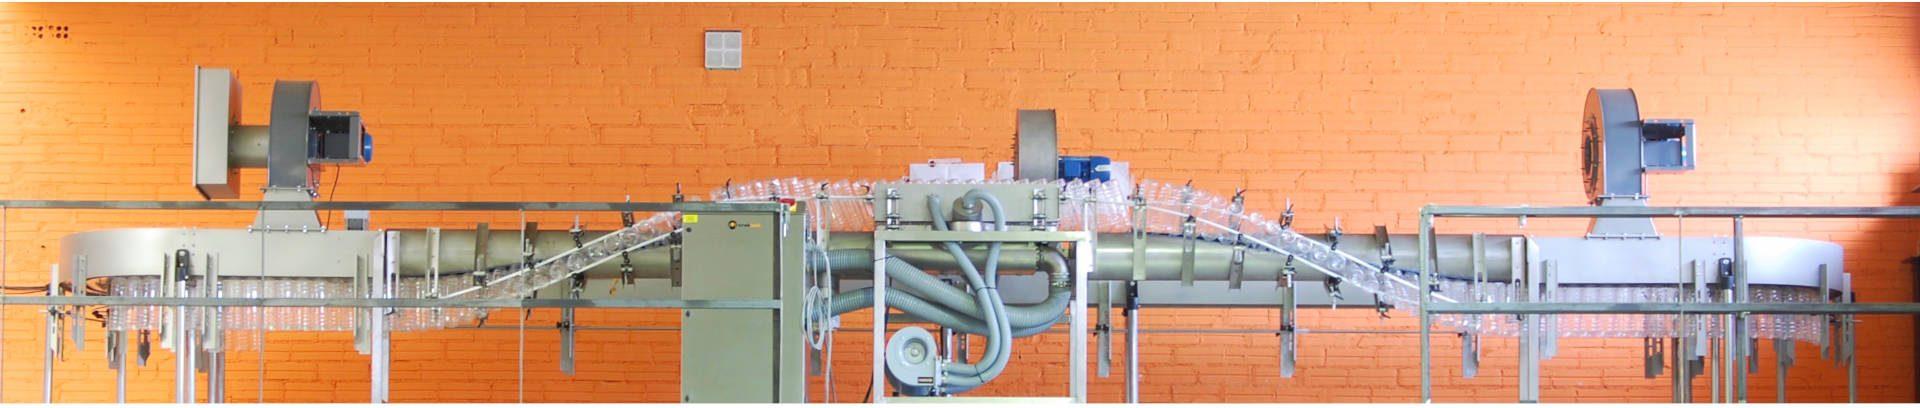 Vista completa de la máquina Enjuagadora Twist Rinser de Traktech para limpieza de envases de PET